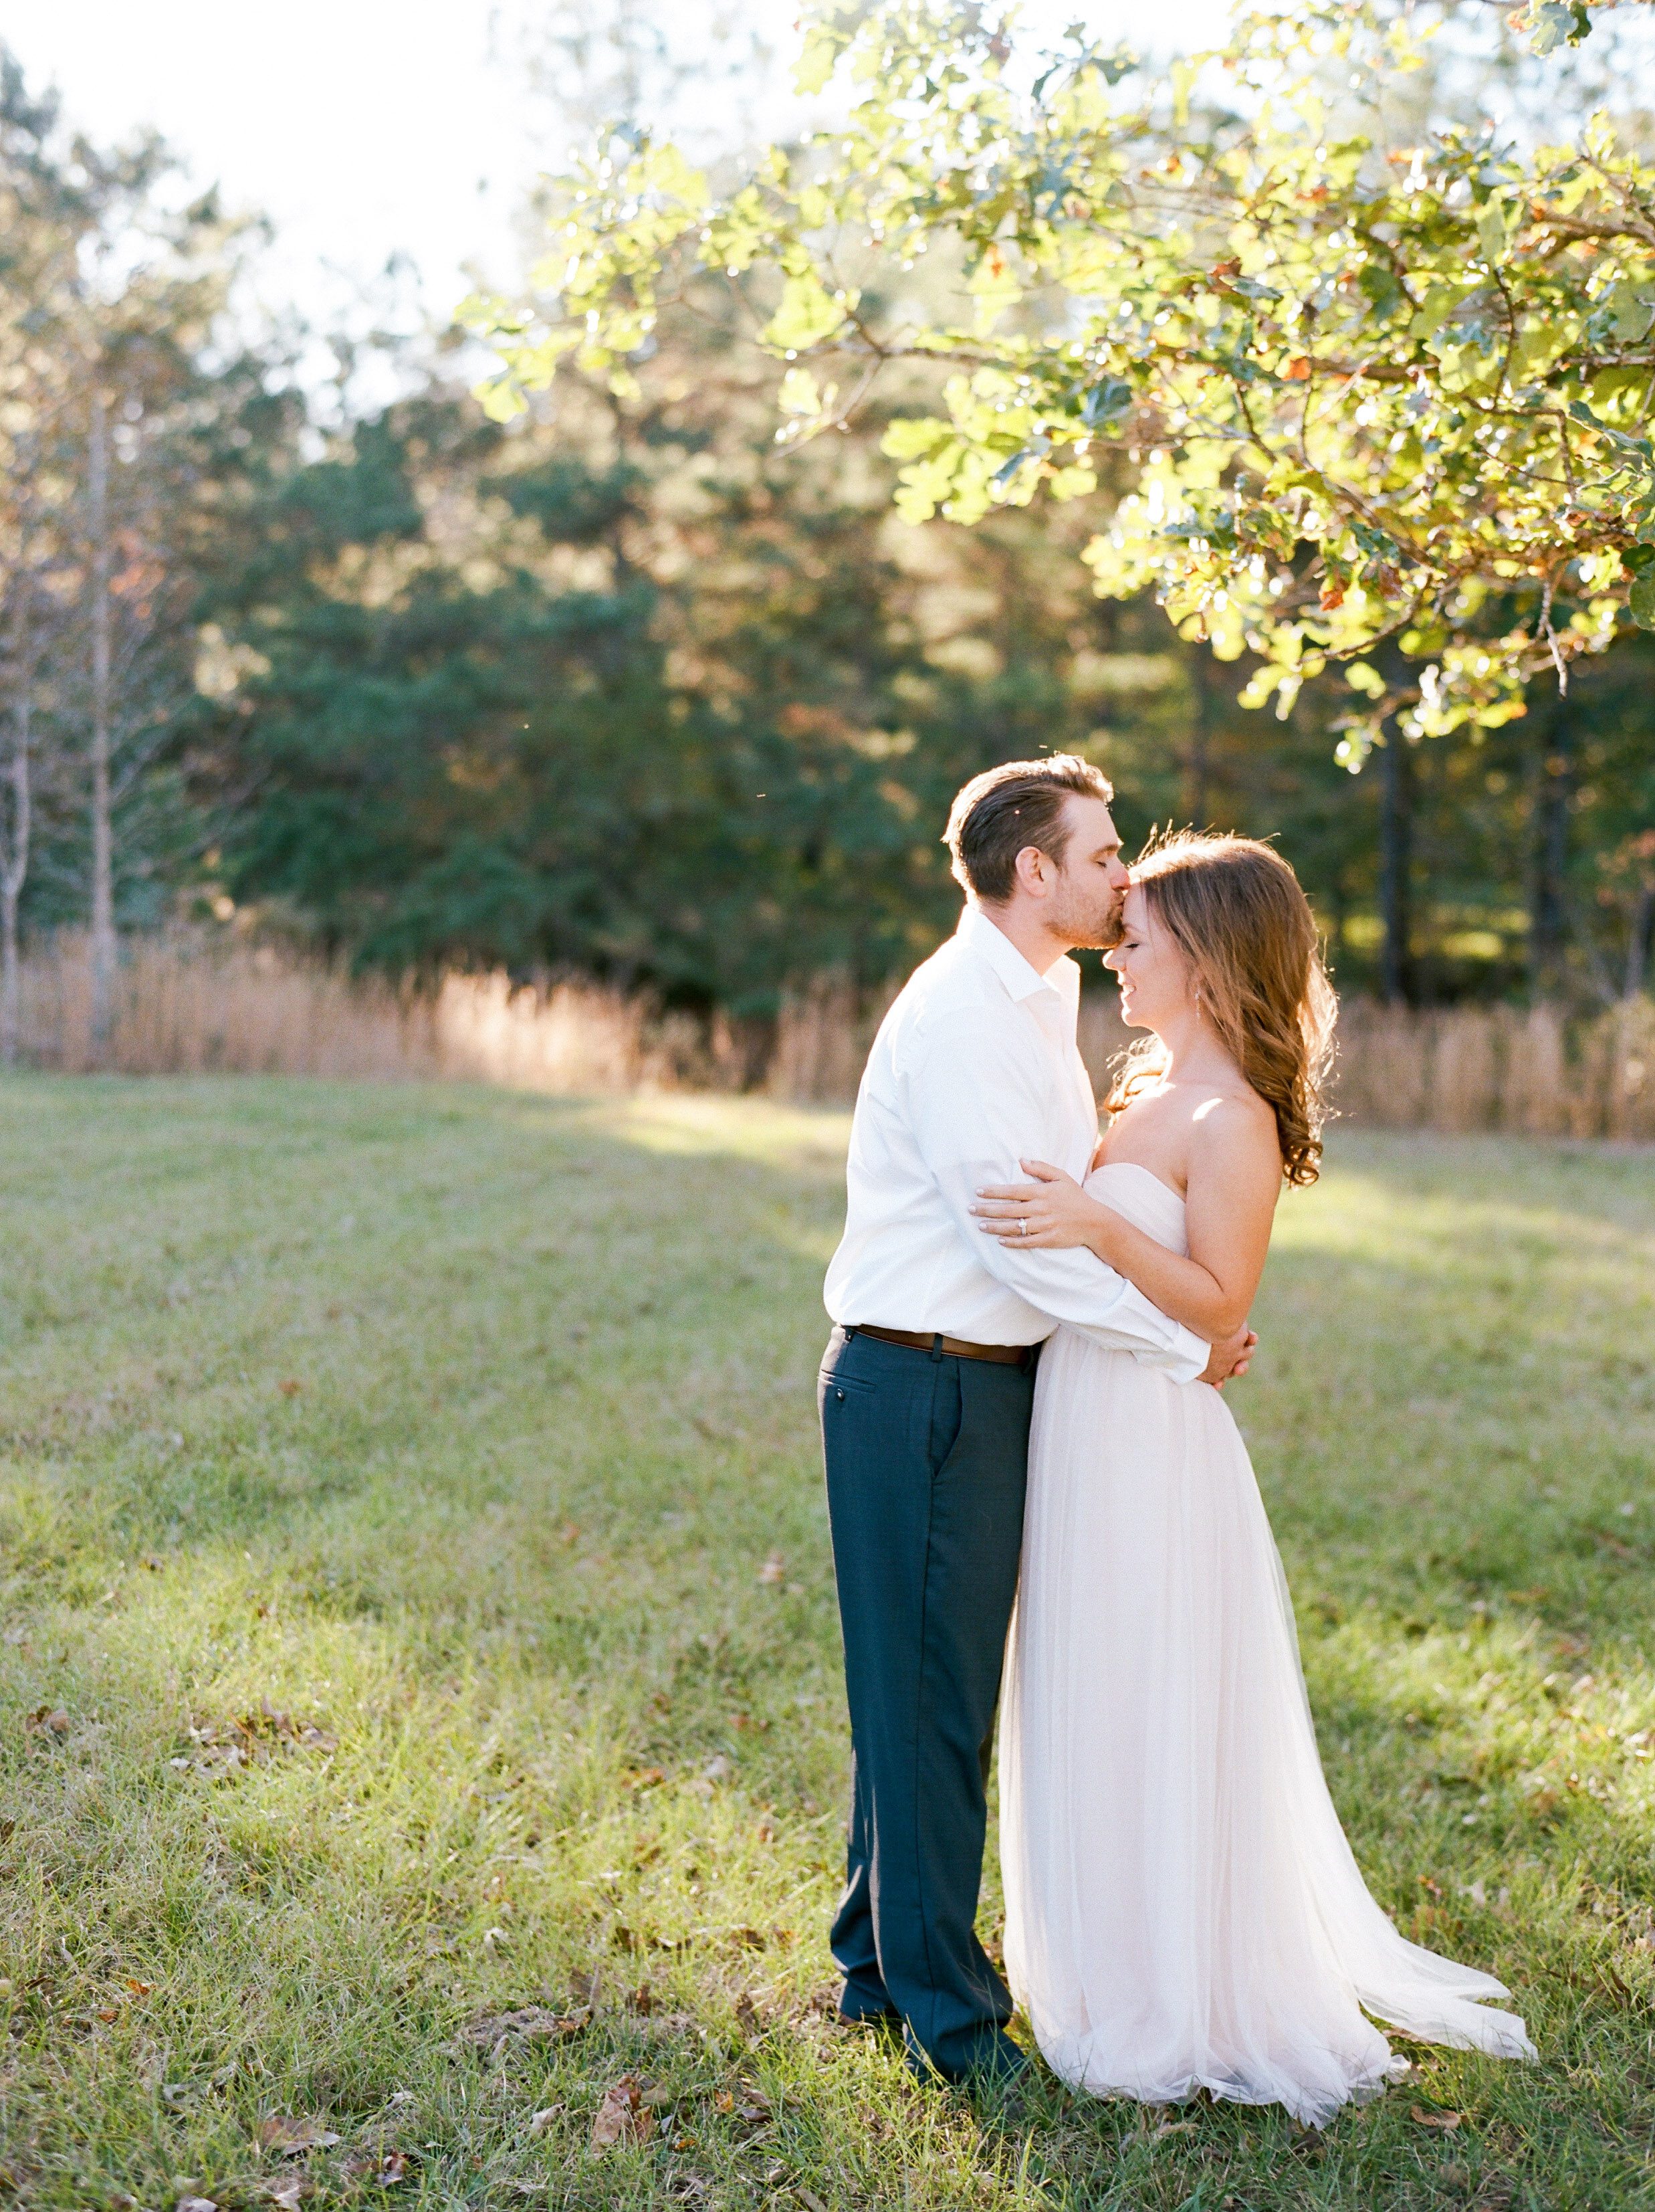 dana-fernandez-photography-houston-wedding-photographer-portraits-engagements-anniversary-session-film-photographer-austin-wedding-photographer-1.jpg